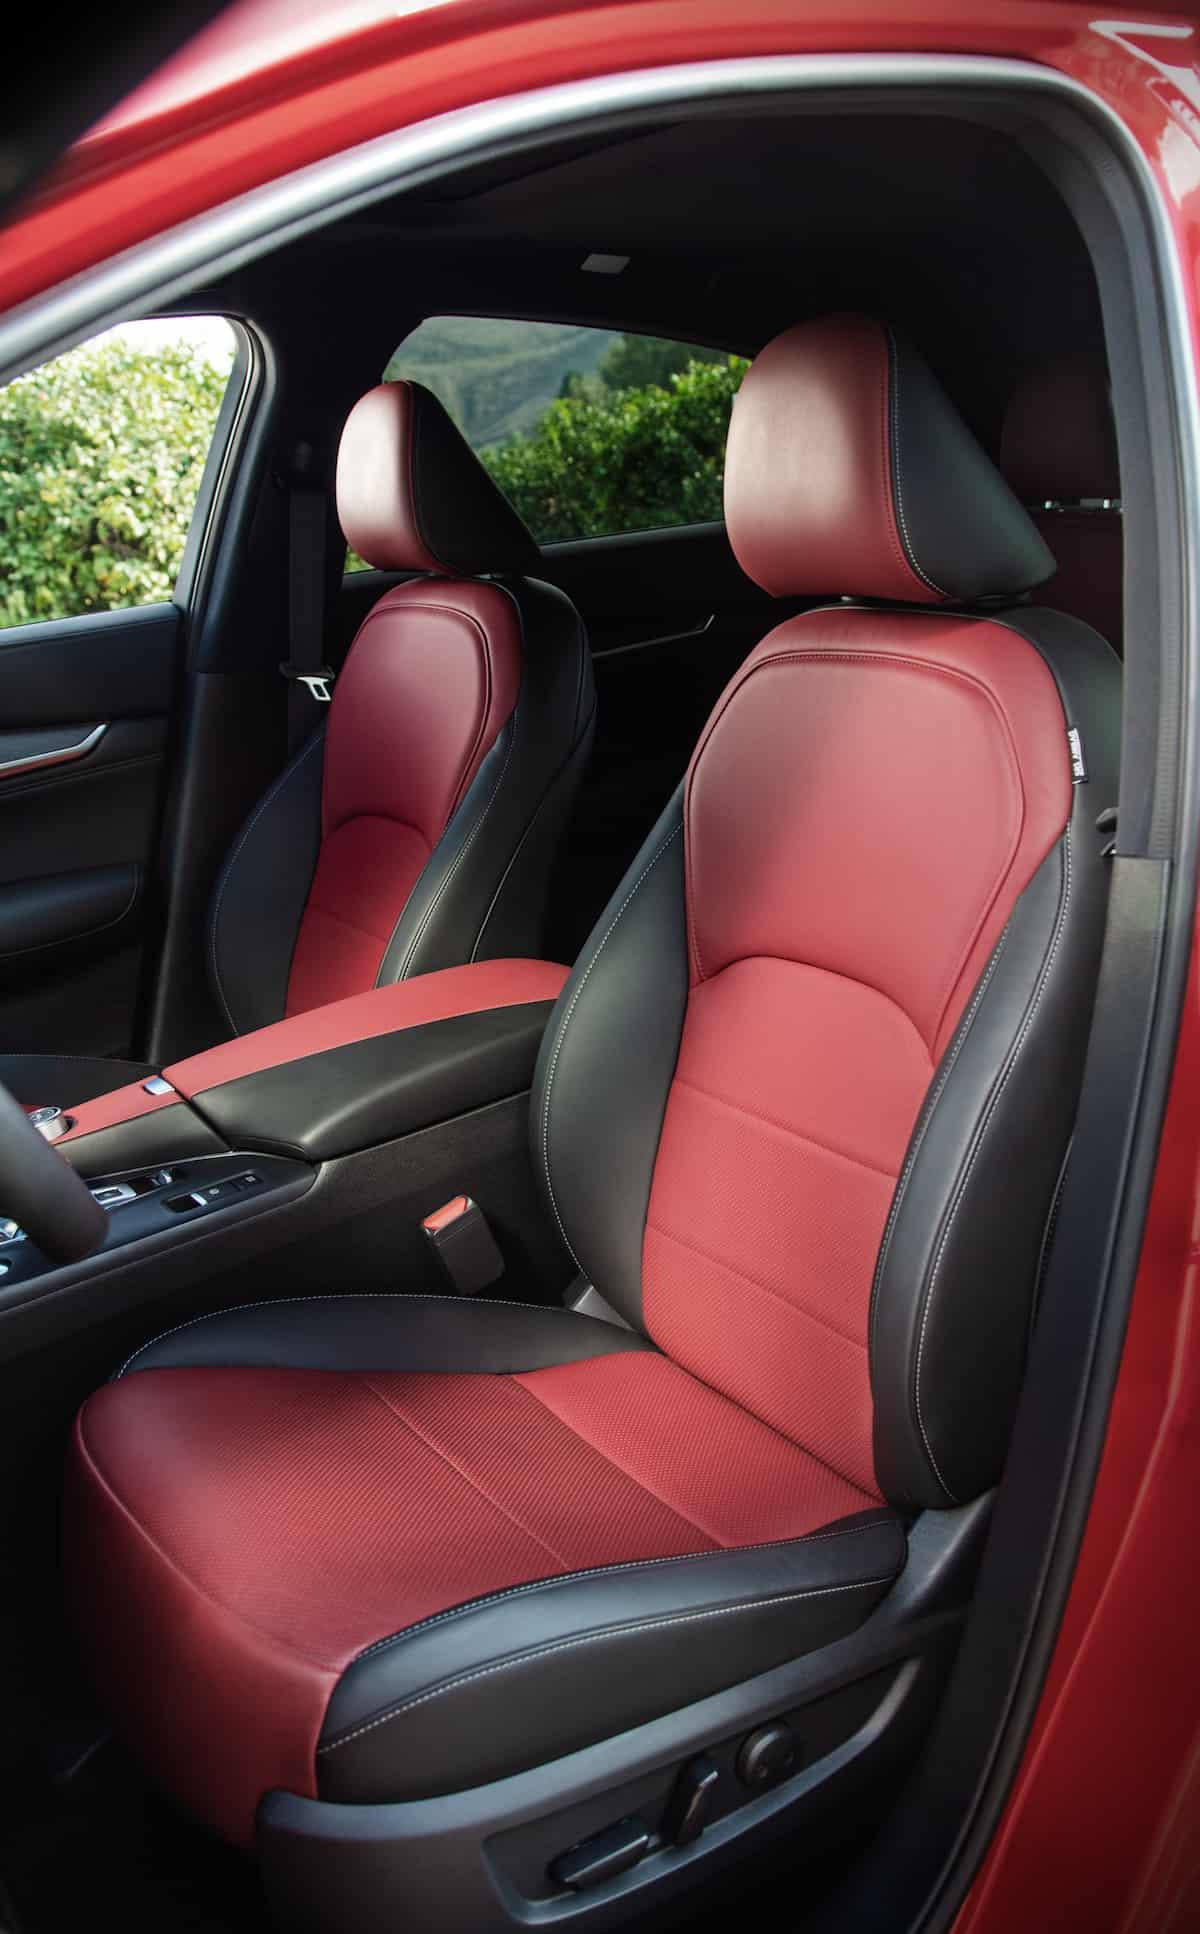 2021 Infiniti QX55 coupe SUV interior7